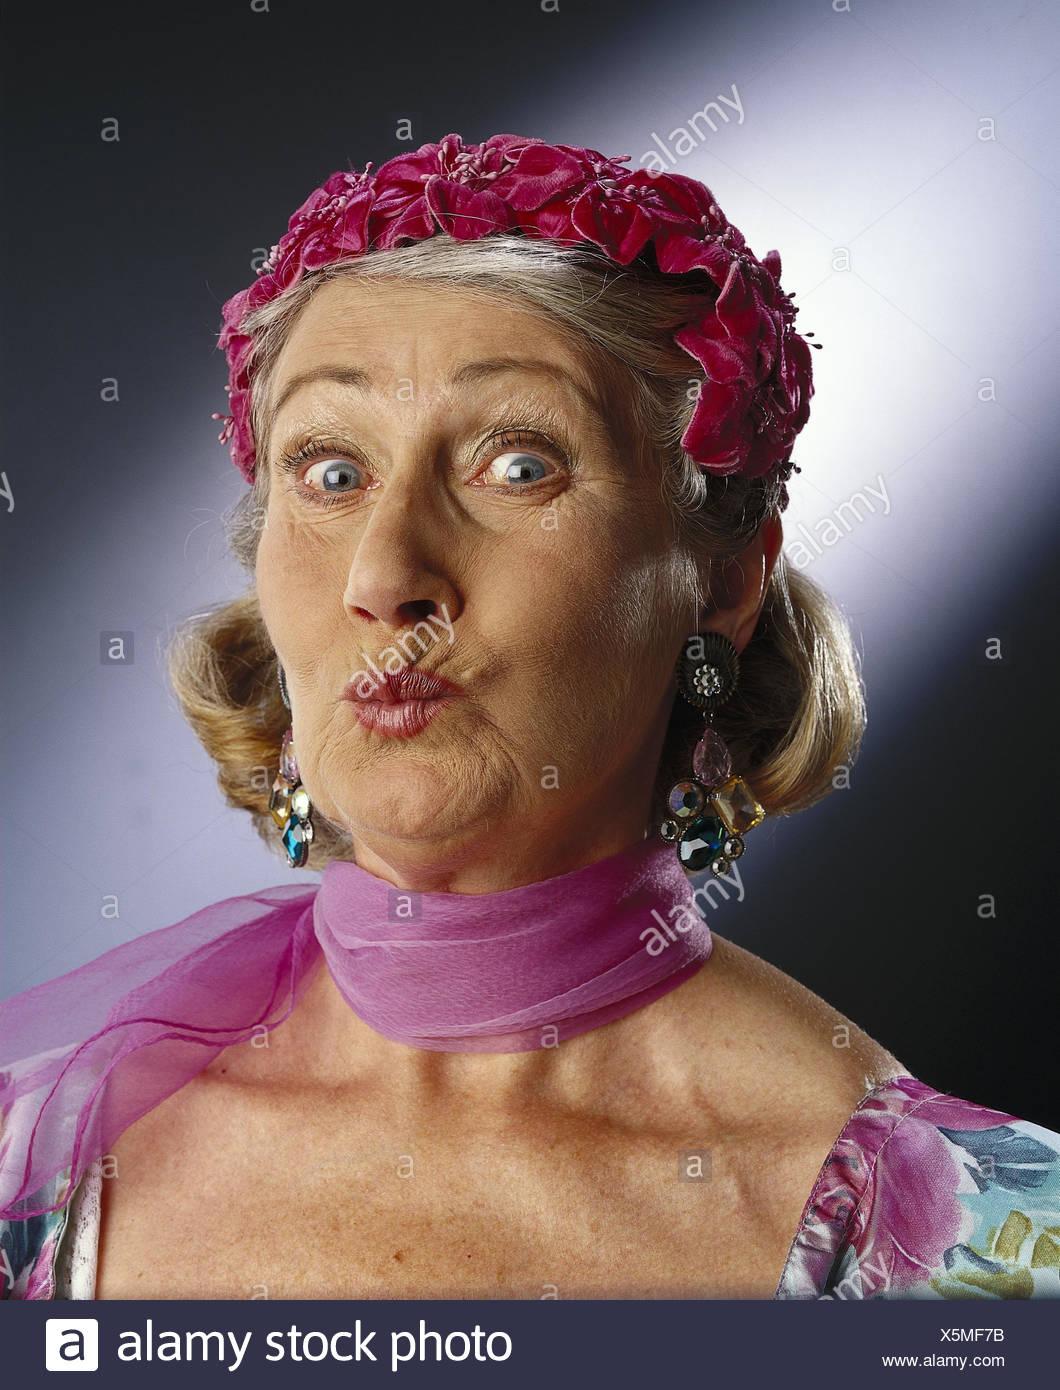 Senior, care, earring, neckerchief, facial play, portrait, mb 125 A7 - Stock Image